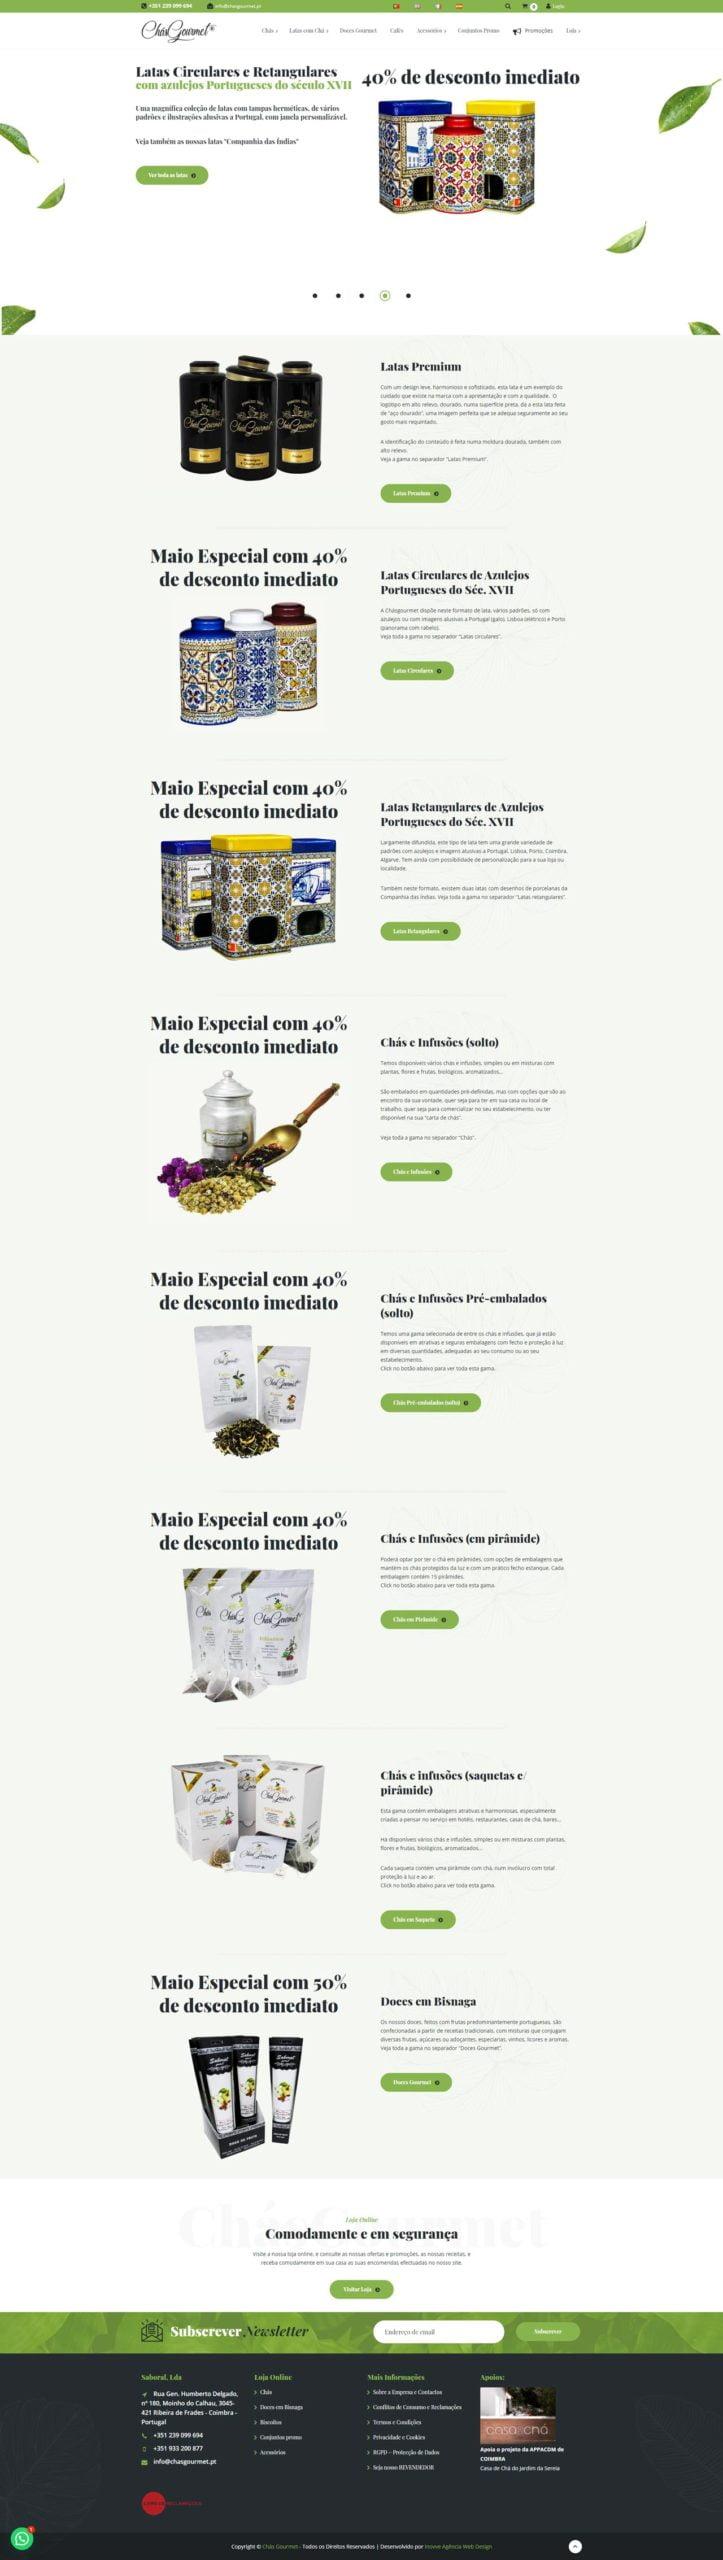 webdesign lojas virtuais ecommerce chasgourmet.pt